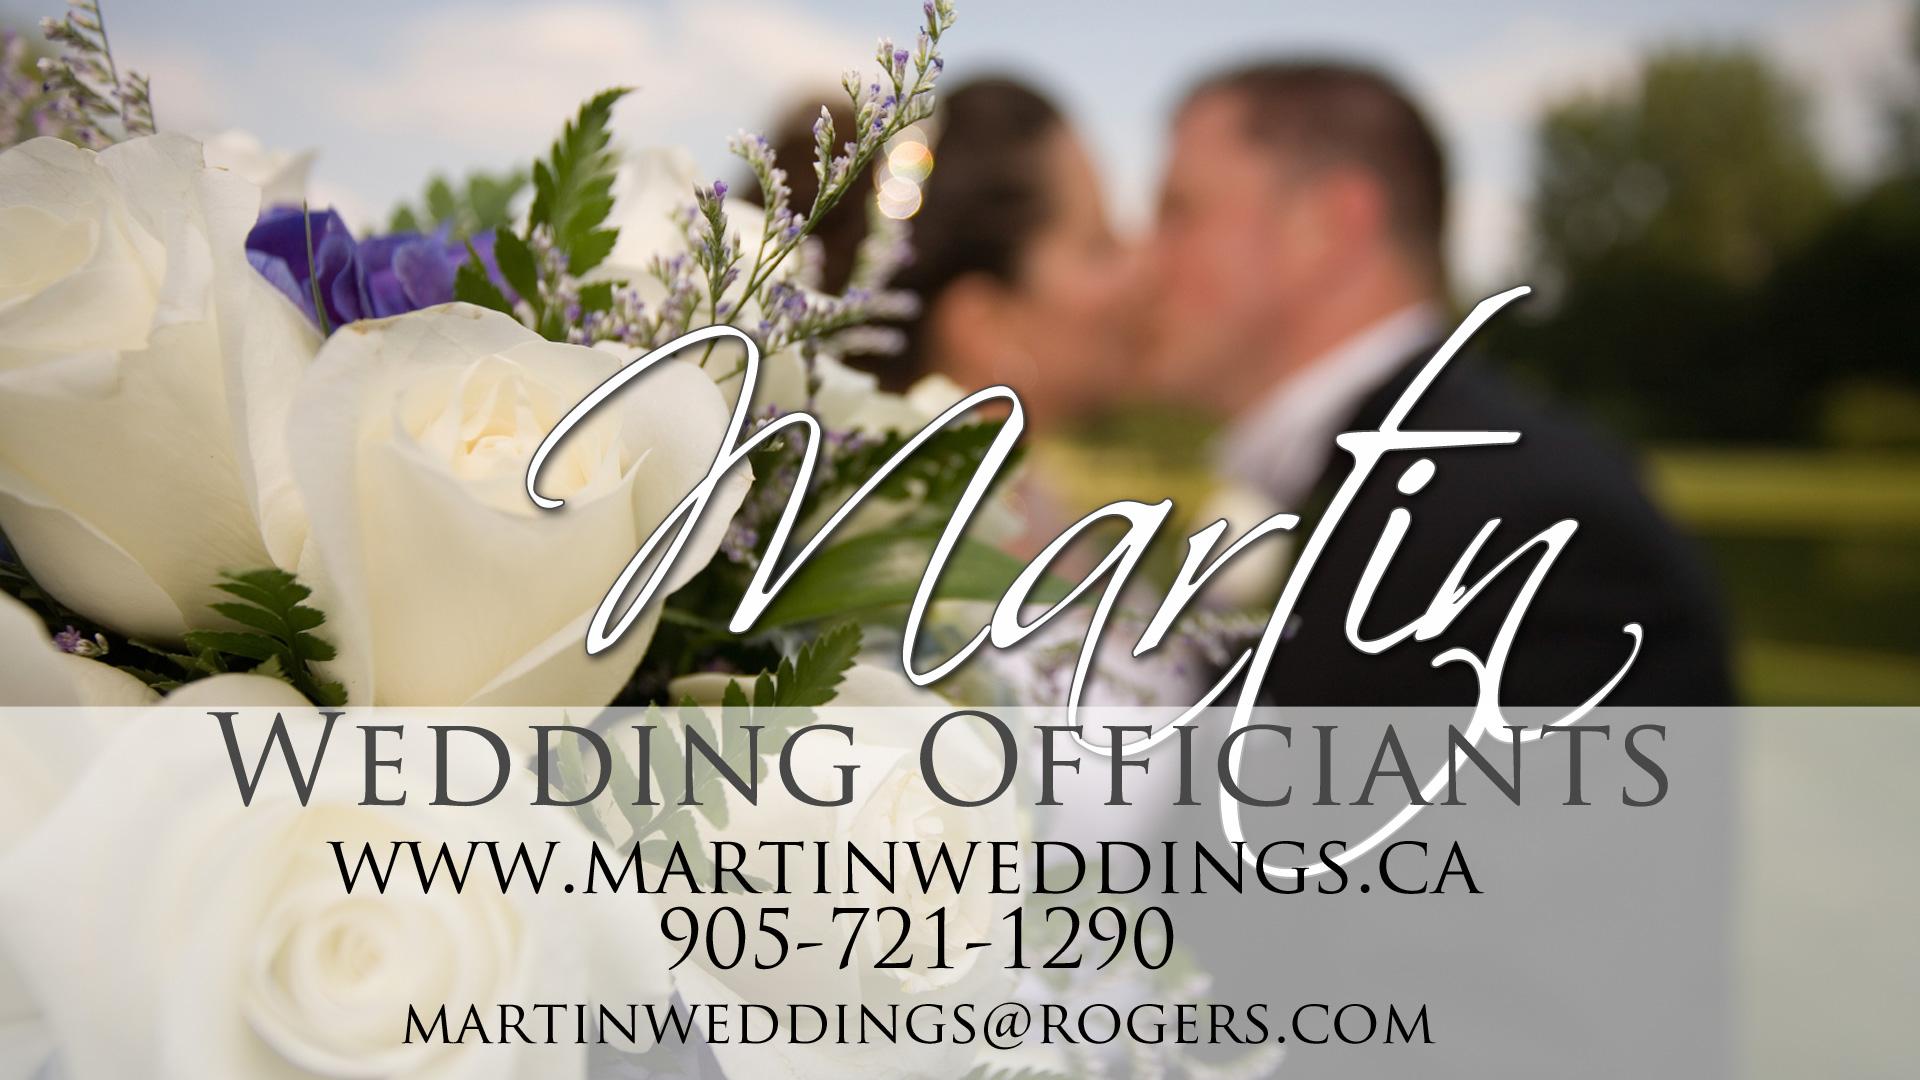 Martin-Weddings-Logo - 2015 - Wide Screen.jpg